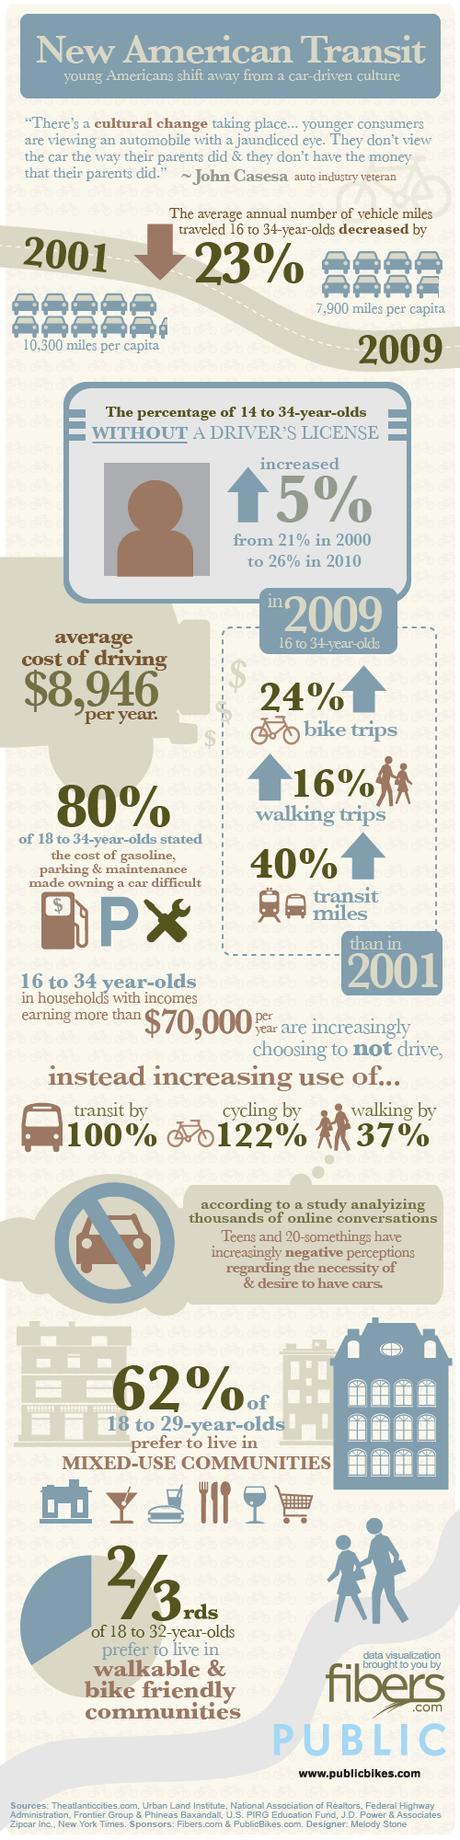 biking infographic, cycling, alternative transportation